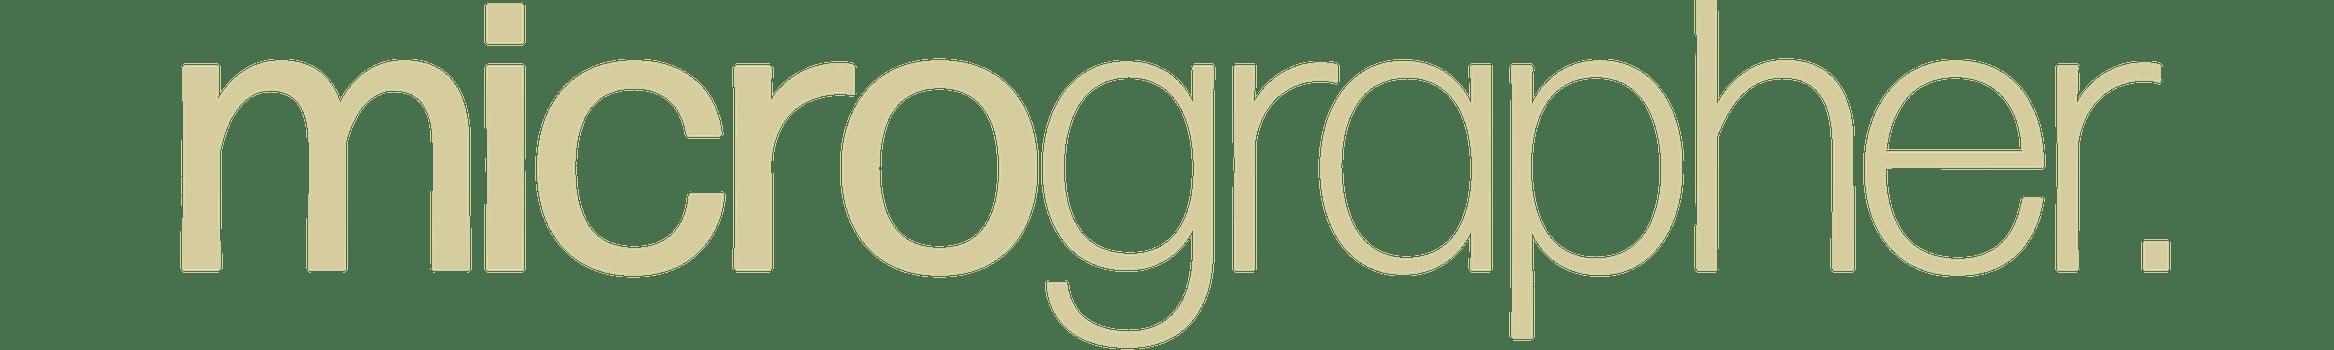 The Micrographer logo